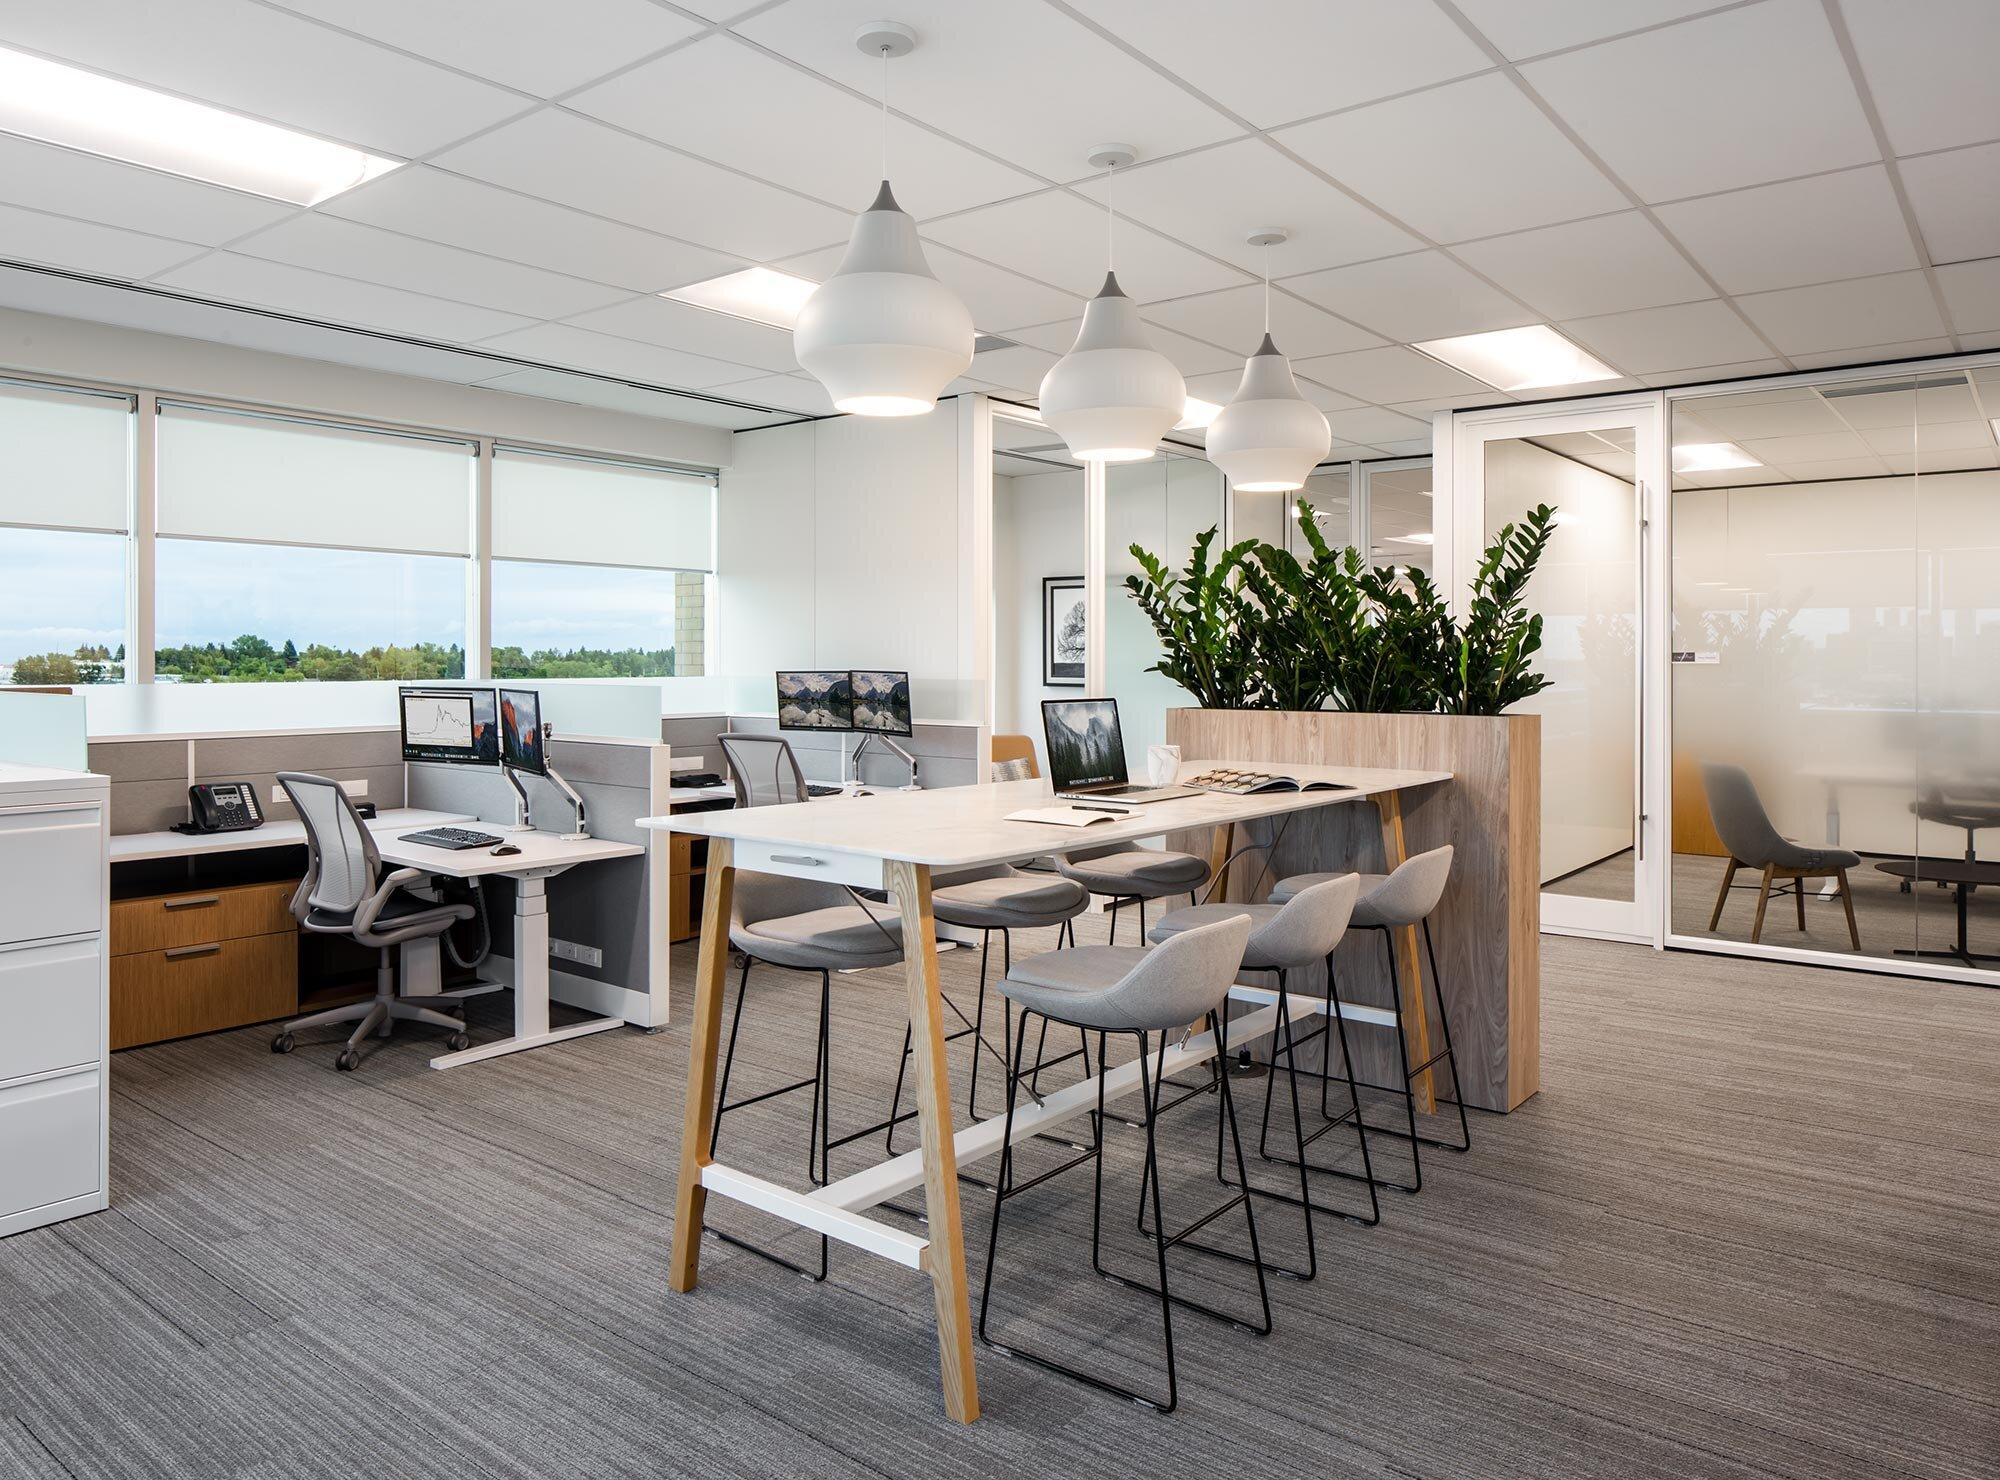 Insurance-services-interior-design-office-calgary-common-table.jpg